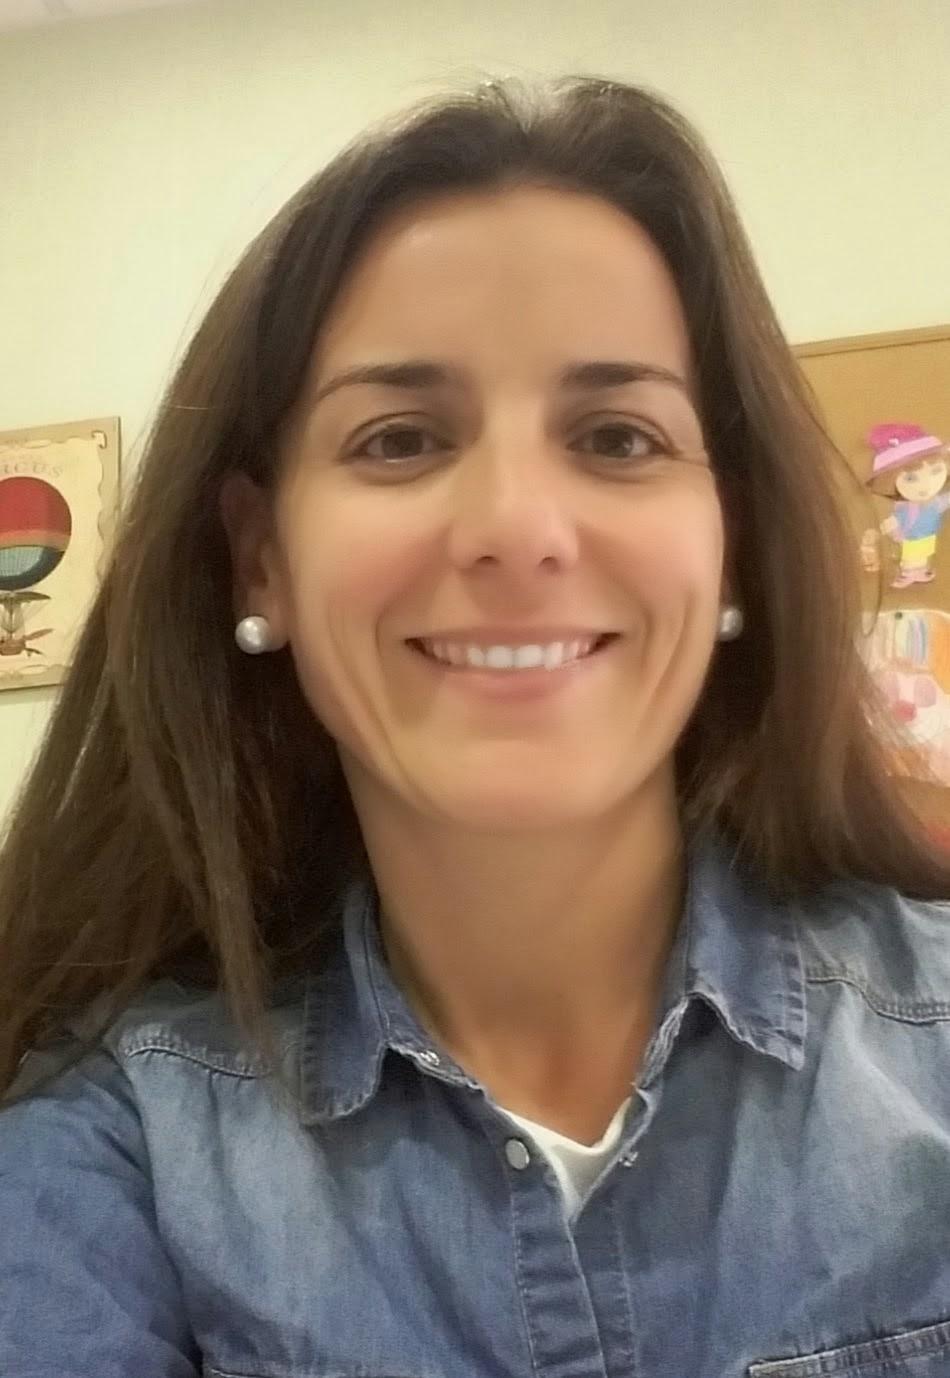 PAMELA BUENO